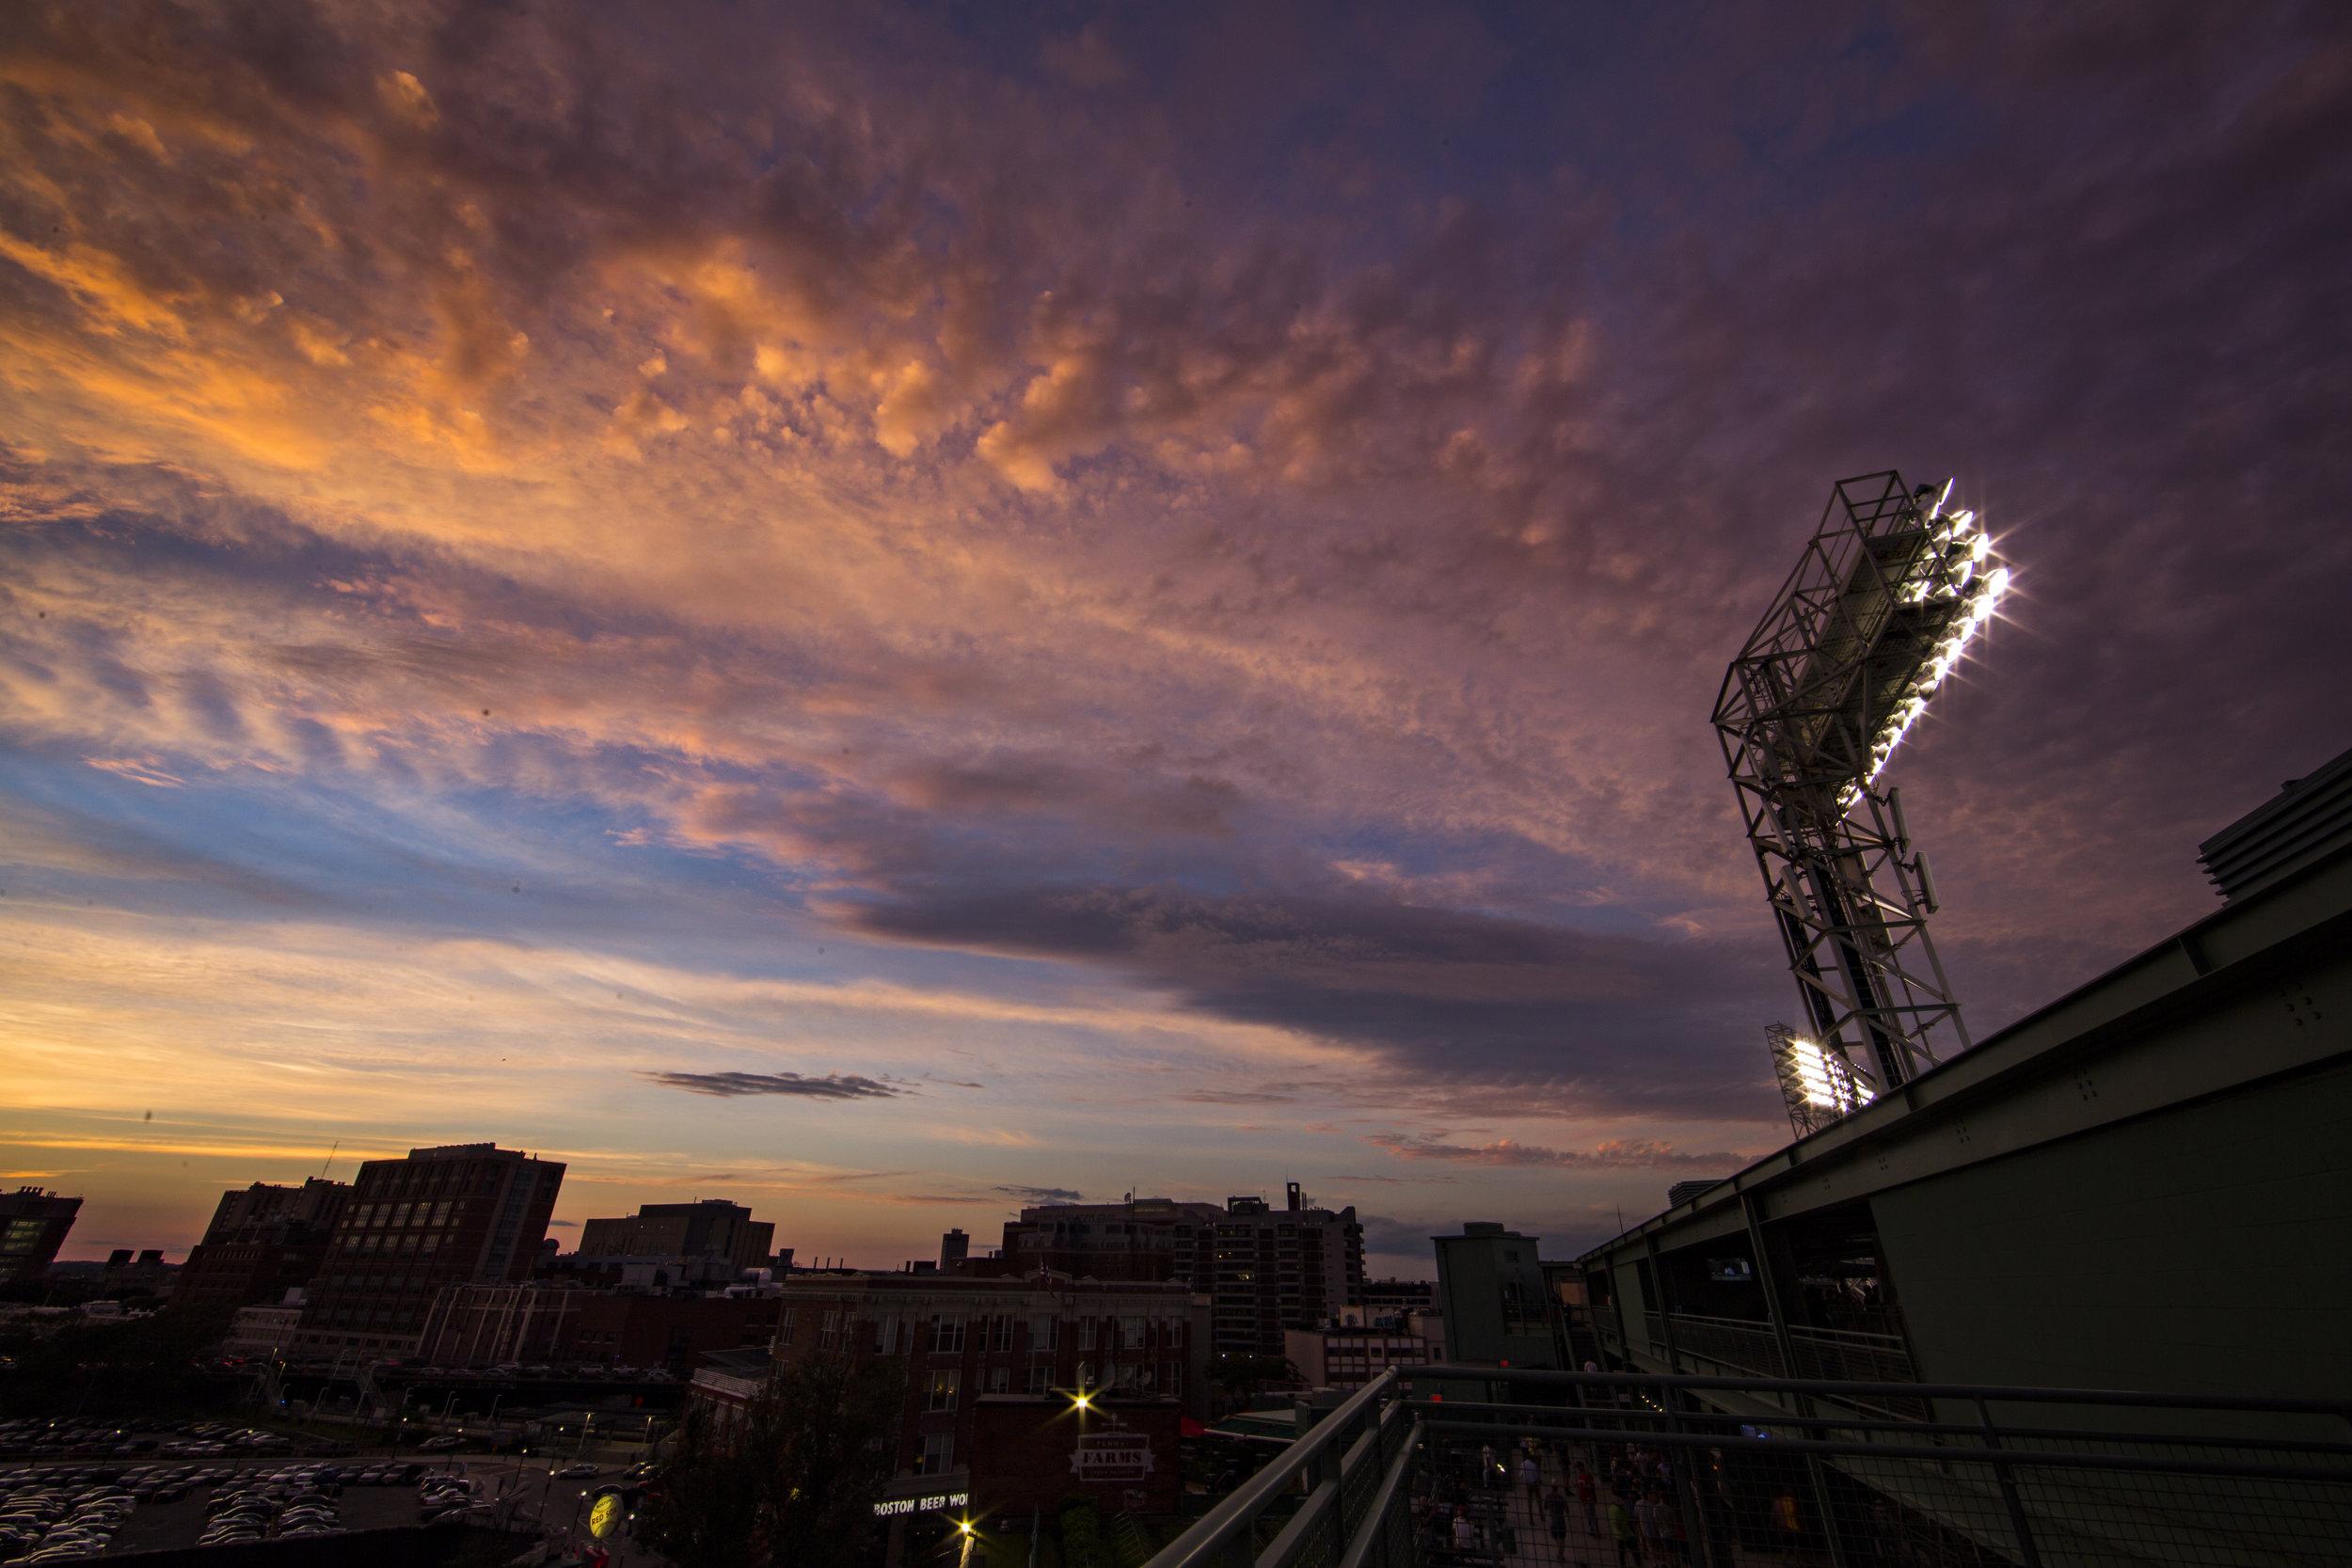 Sunset over Light Tower